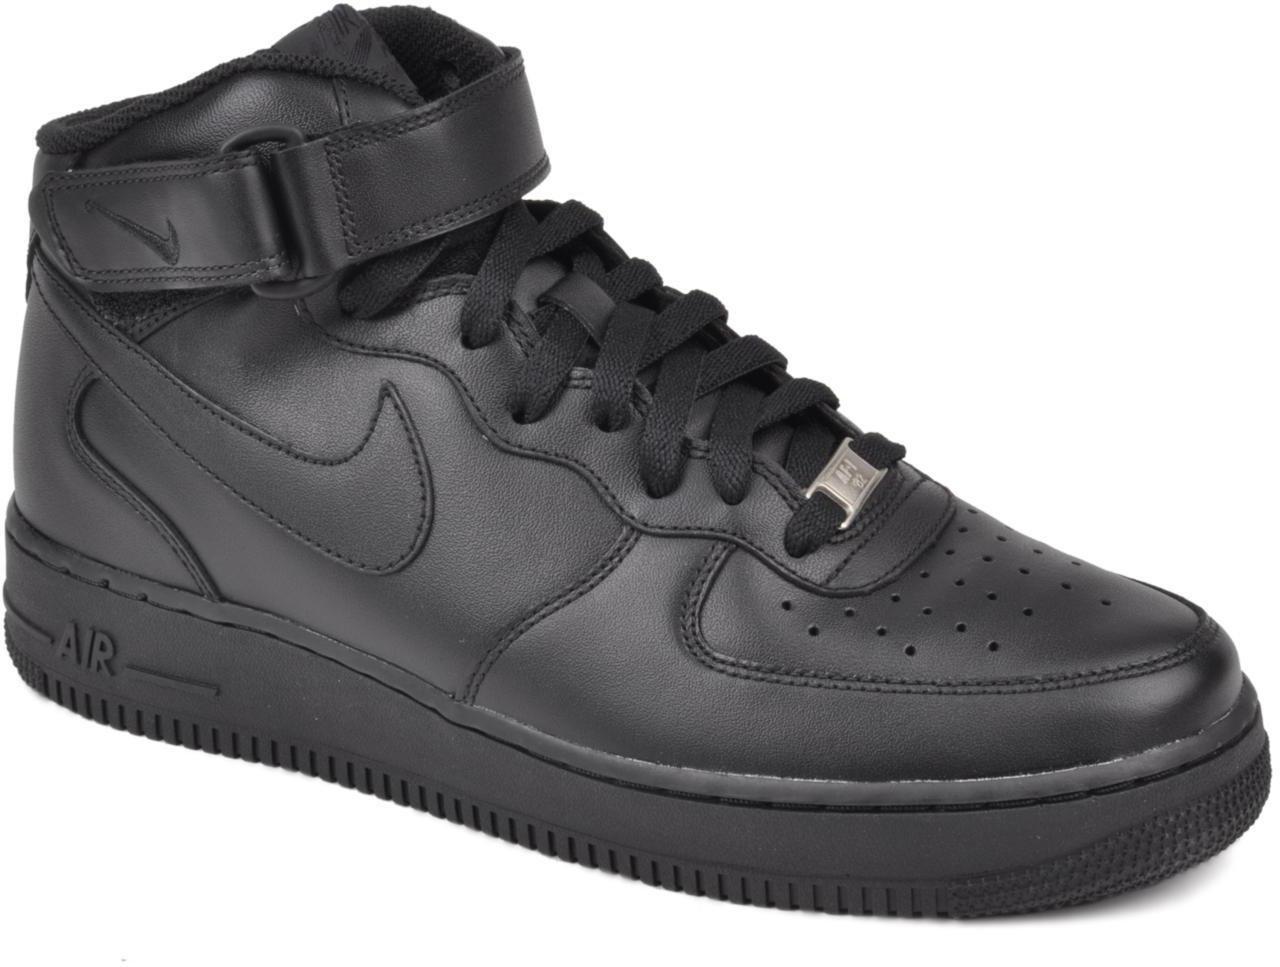 competitive price b0344 8ae1c Nike Air Force 1 Mid ab 52,99 € günstig im Preisvergleich kaufen